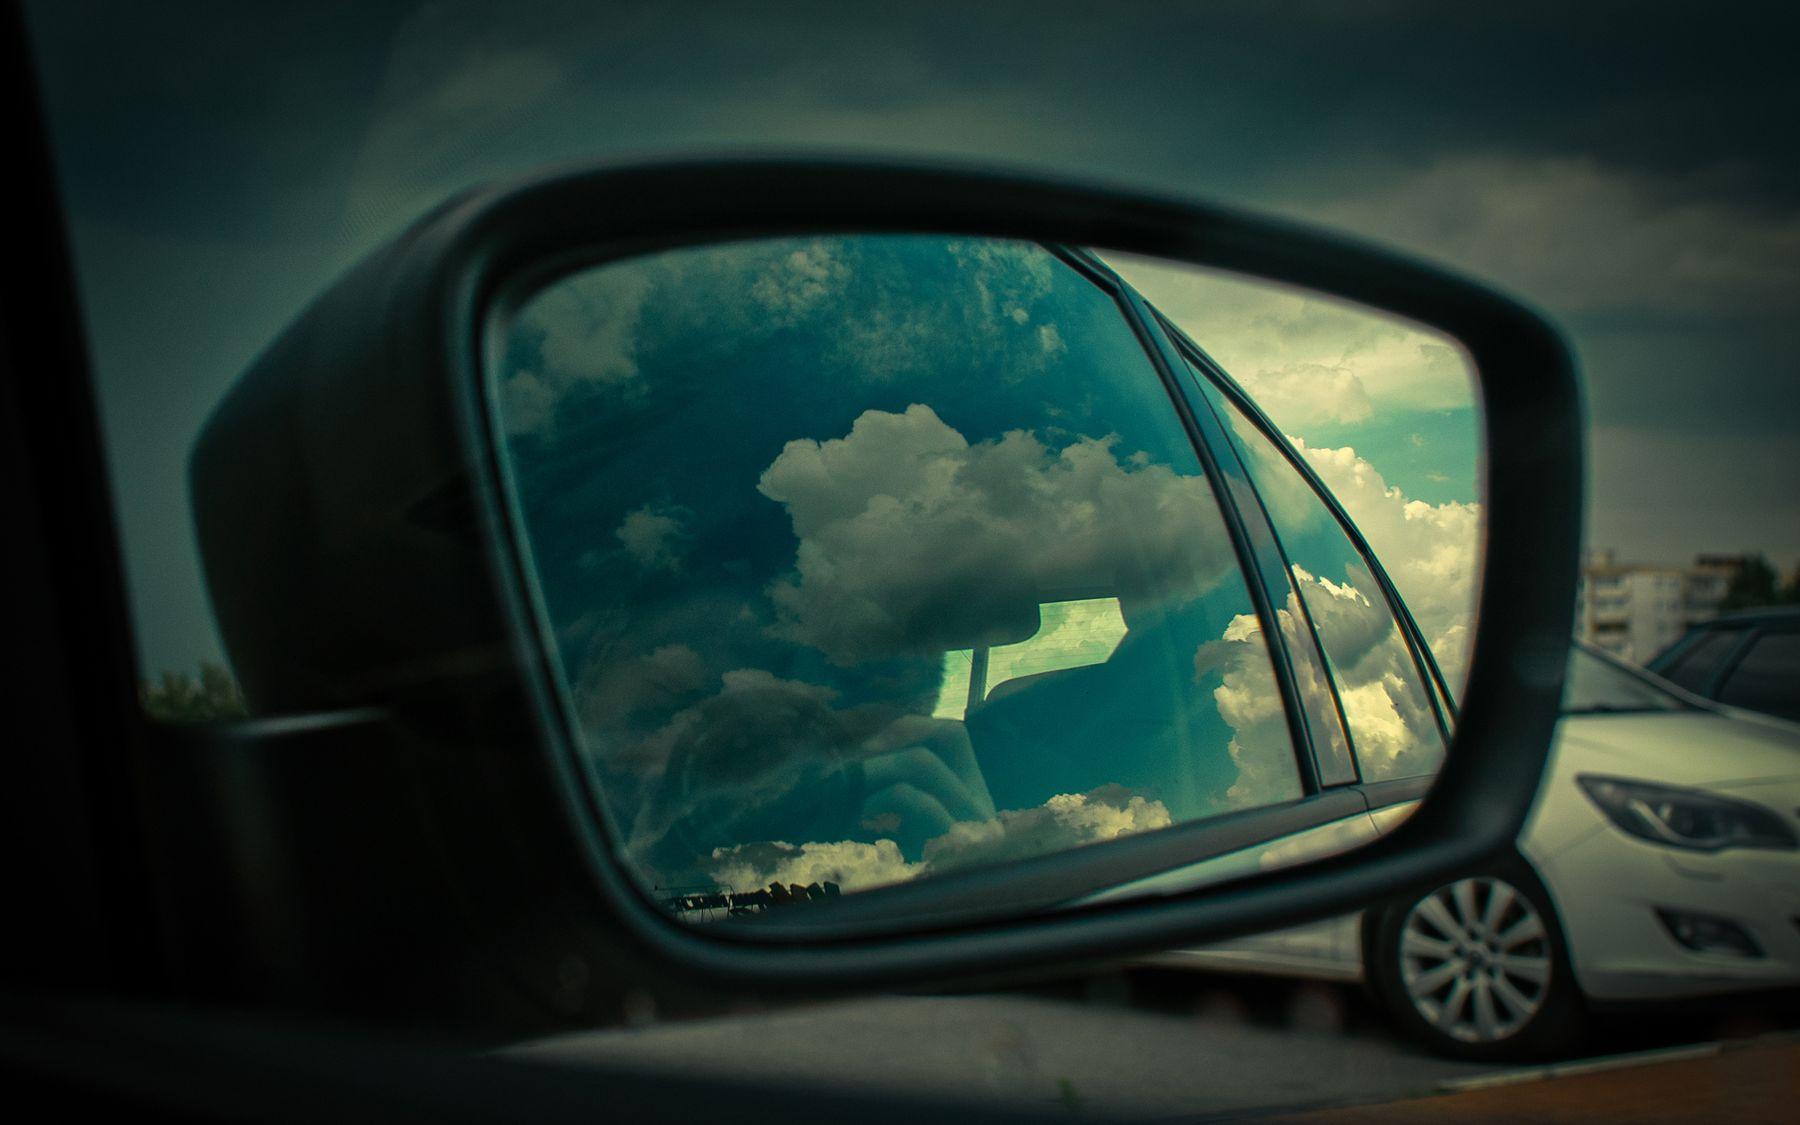 Автопортрет с облаками